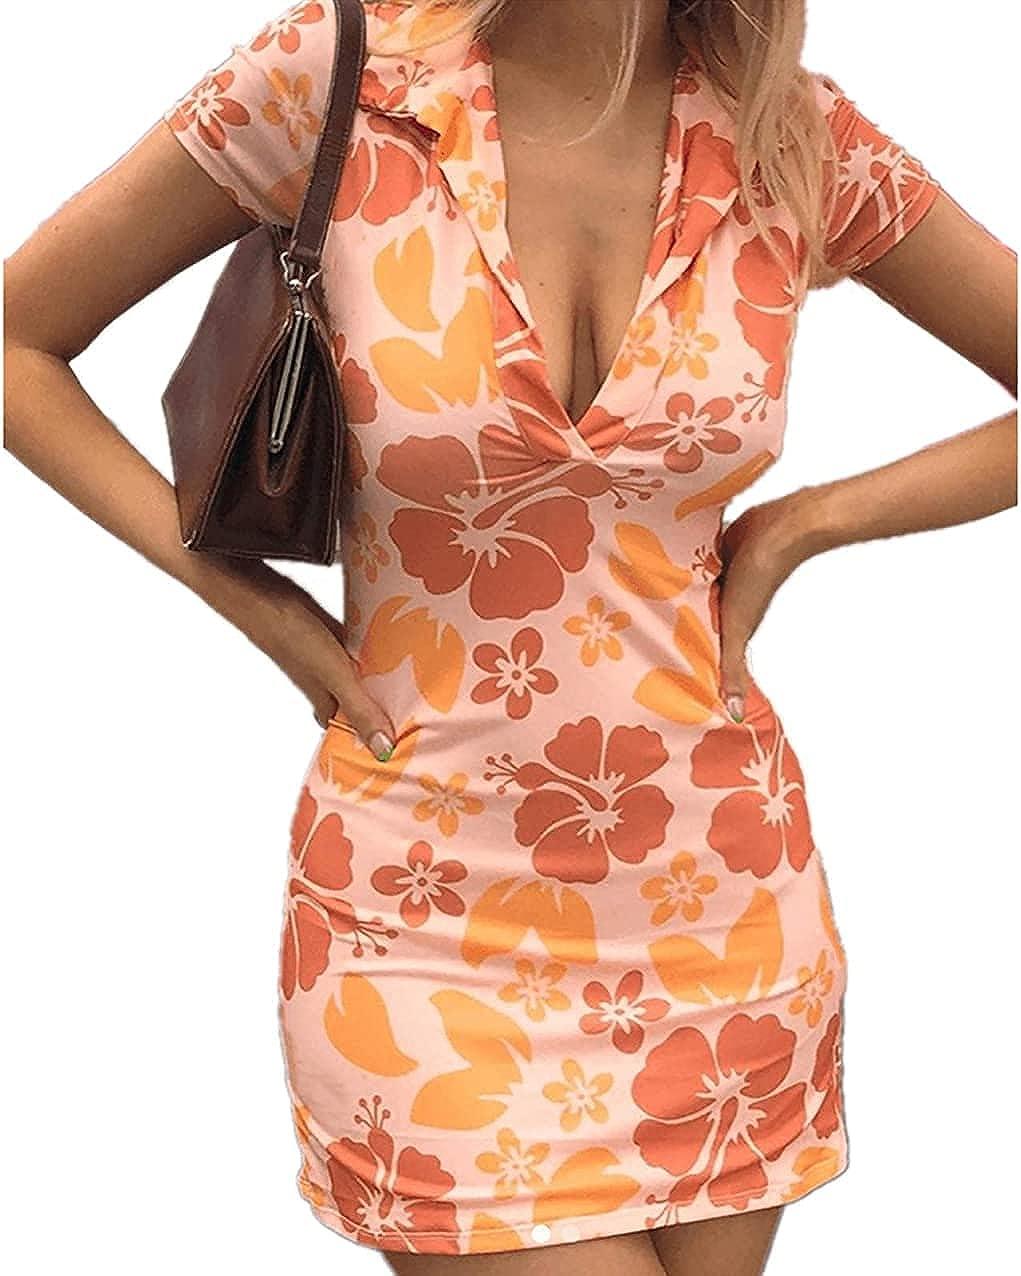 Women's Boho Mini/Maxi Dresses Y2K E-Girls 90s Slim Bodycon Dress Funny Print Sleeveless Summer Sexy Streetwear